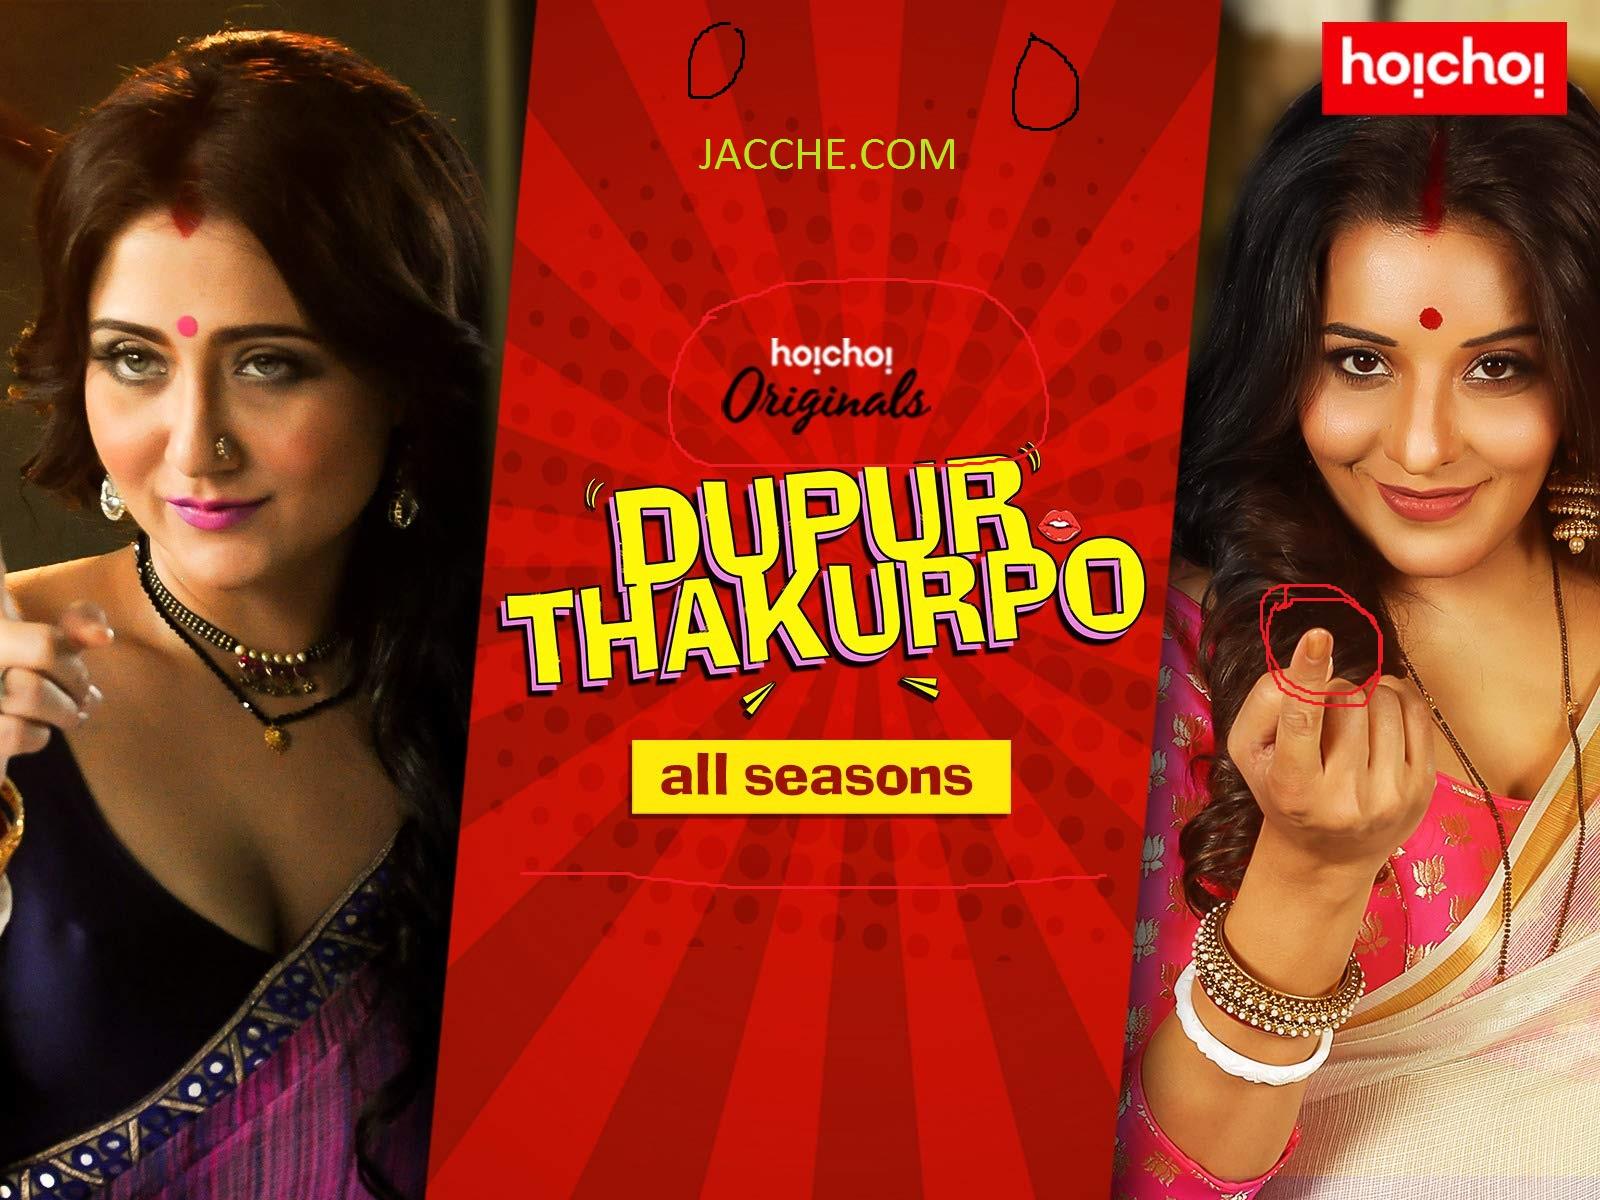 Dupur Thakurpo